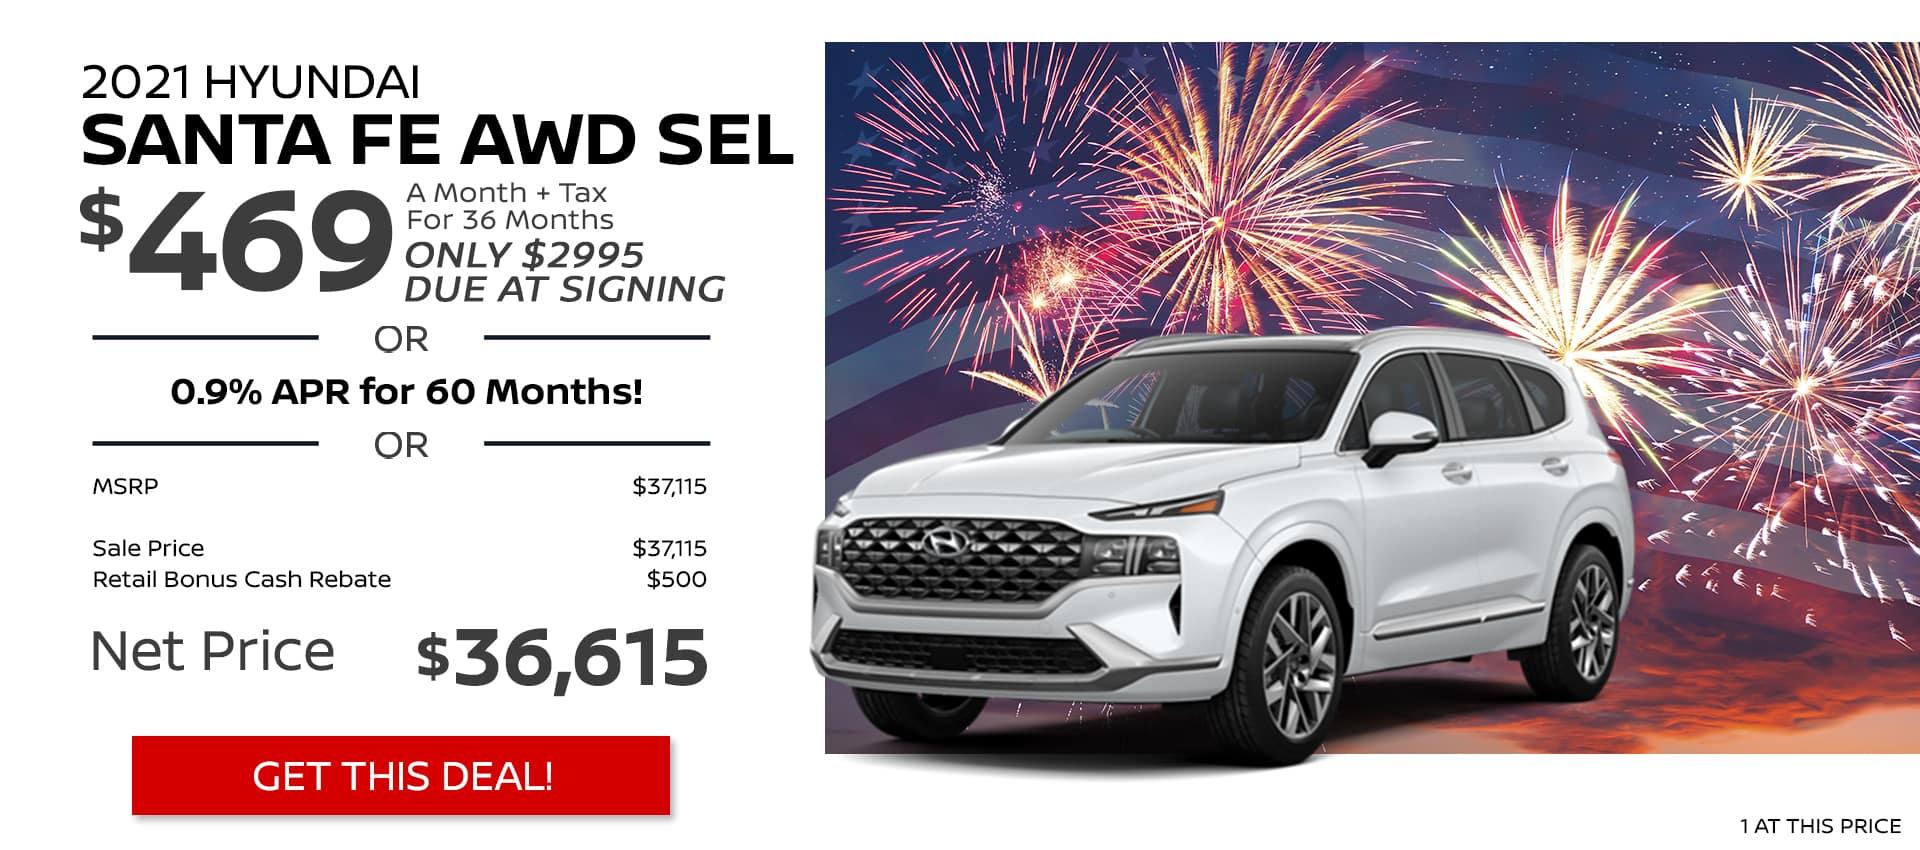 Hyundai Santa Fe AWD SEL JULY